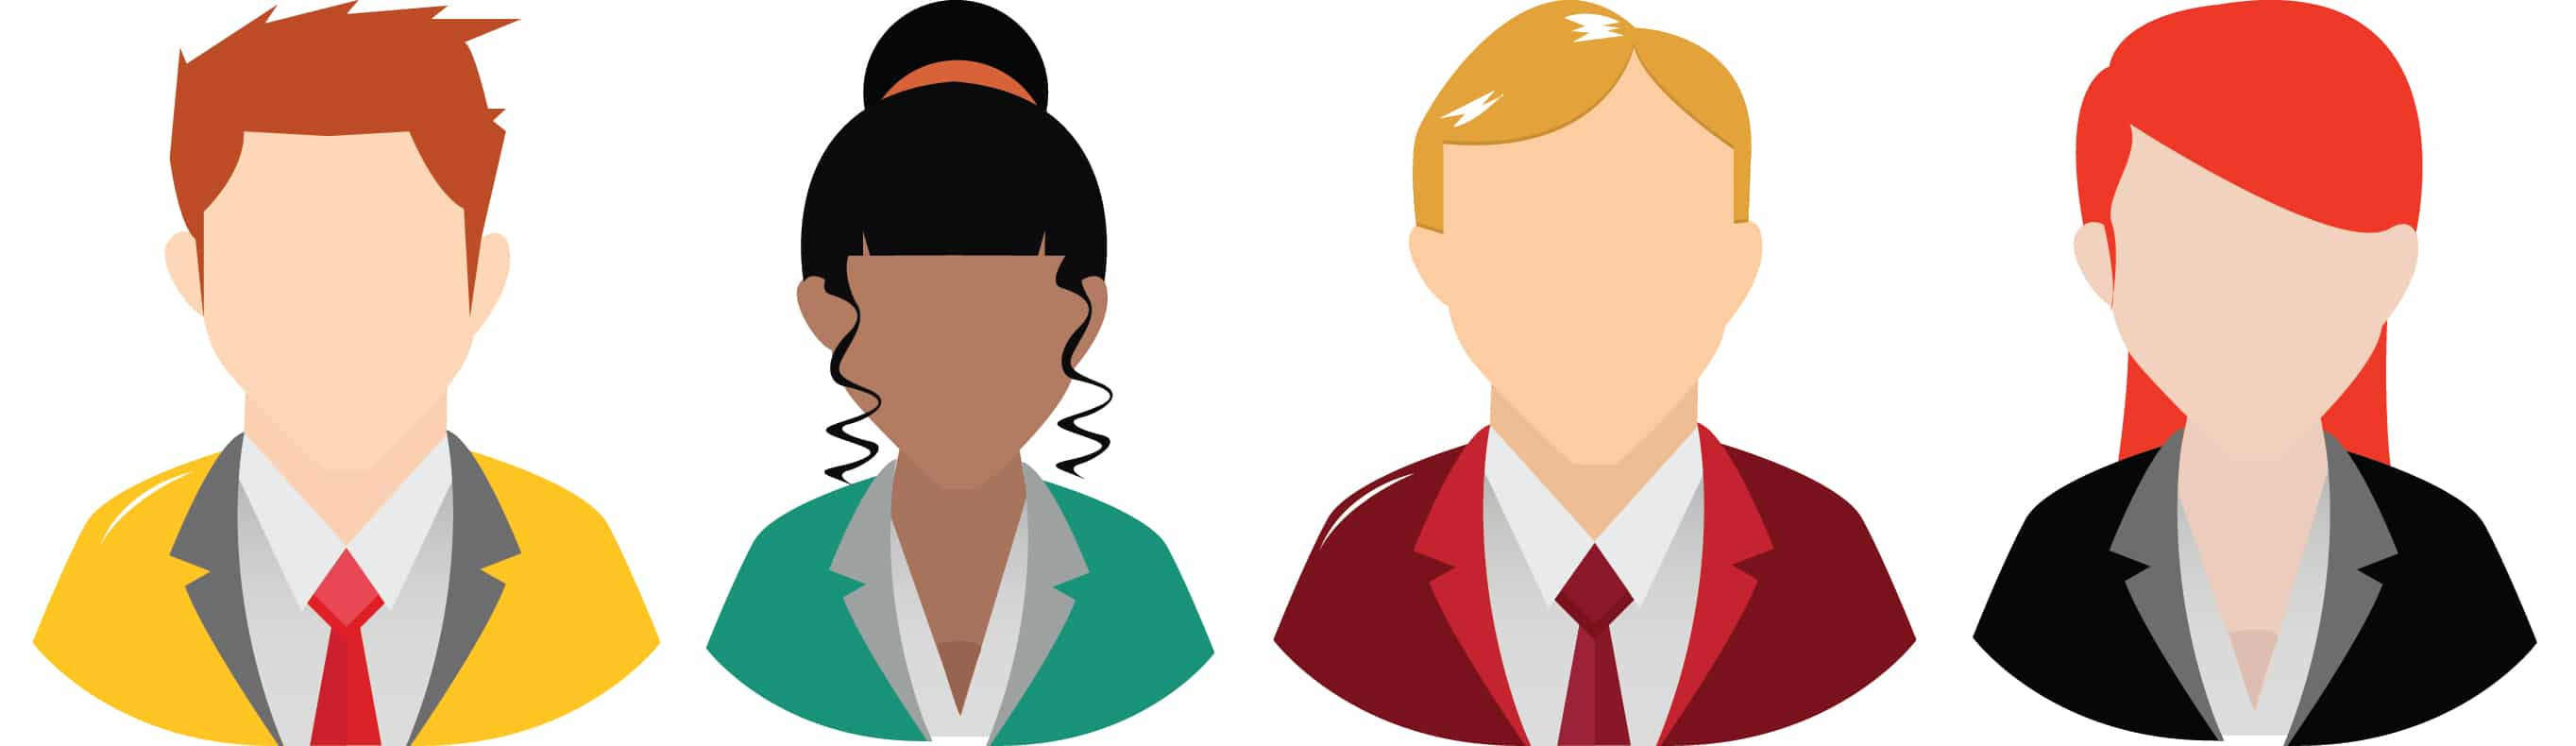 Buyer Personas - Crea i Tuoi Personaggi - Buyer Personas Esempi - Web Agency Ragusa & SEO Ragusa